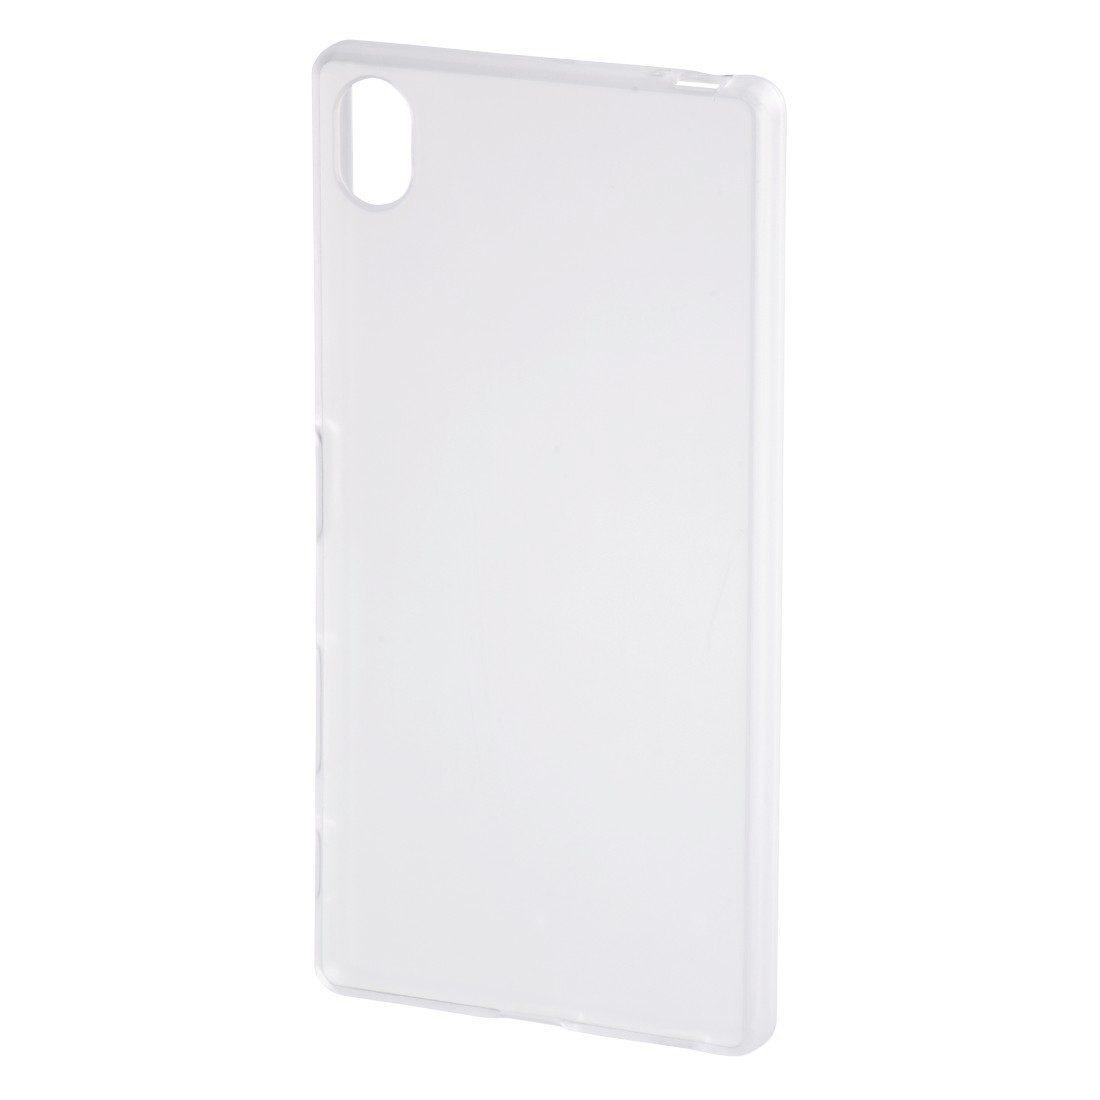 Hama Hülle f. Sony Xperia Z5 Premium Case Schutzhülle Handyhülle »Handy Cover aus flexiblem TPU«